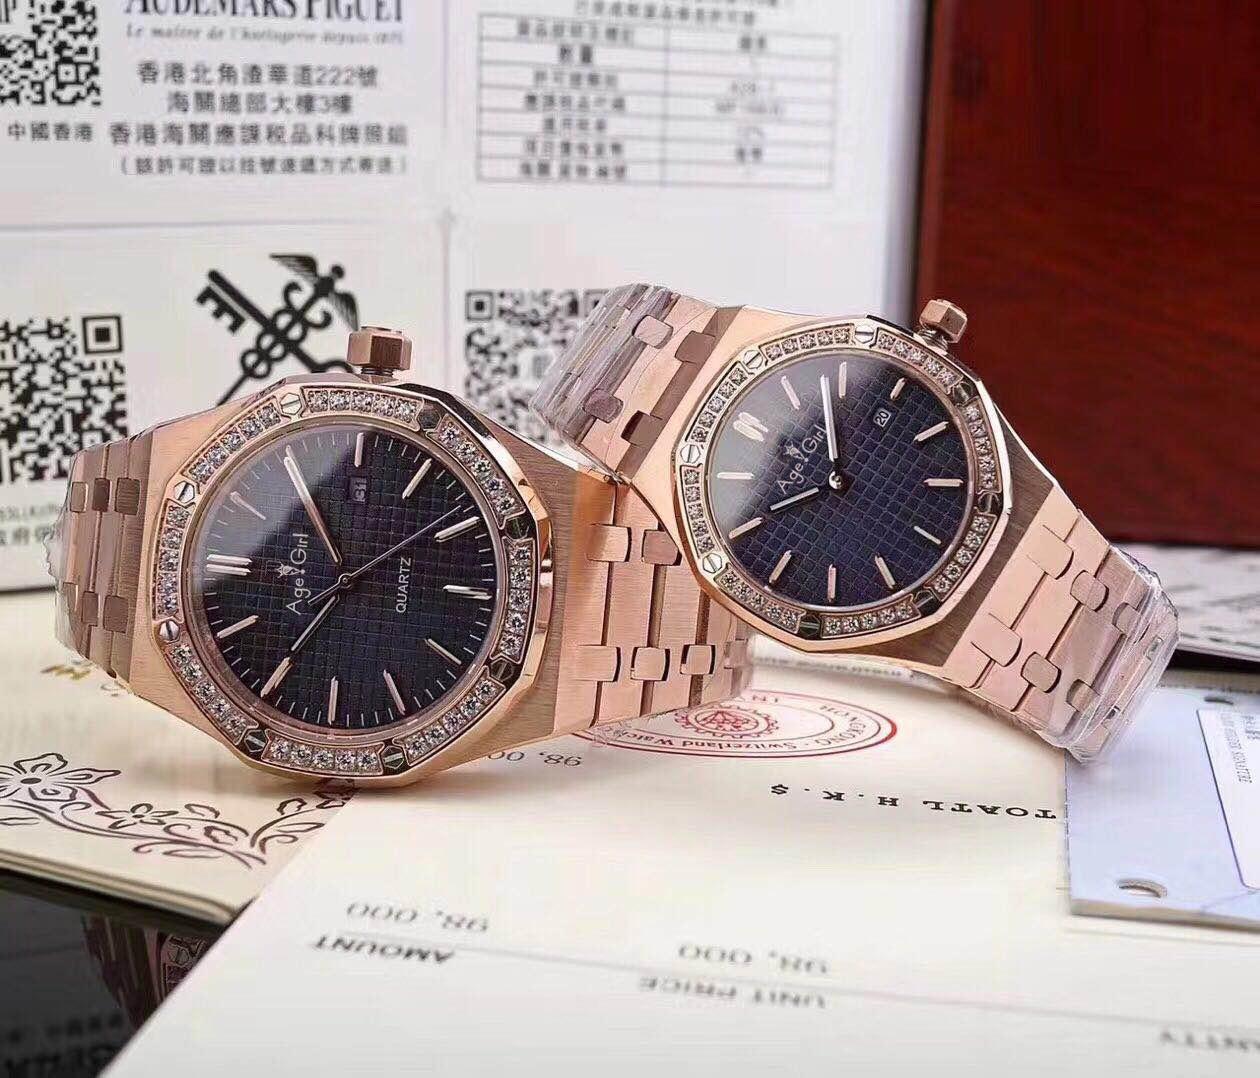 Top Luxury Brand New Men Women Stainless Steel Japanese Quartz Sapphire Rose Gold Black Blue Diamond Sport Watch Waterproof AAA+